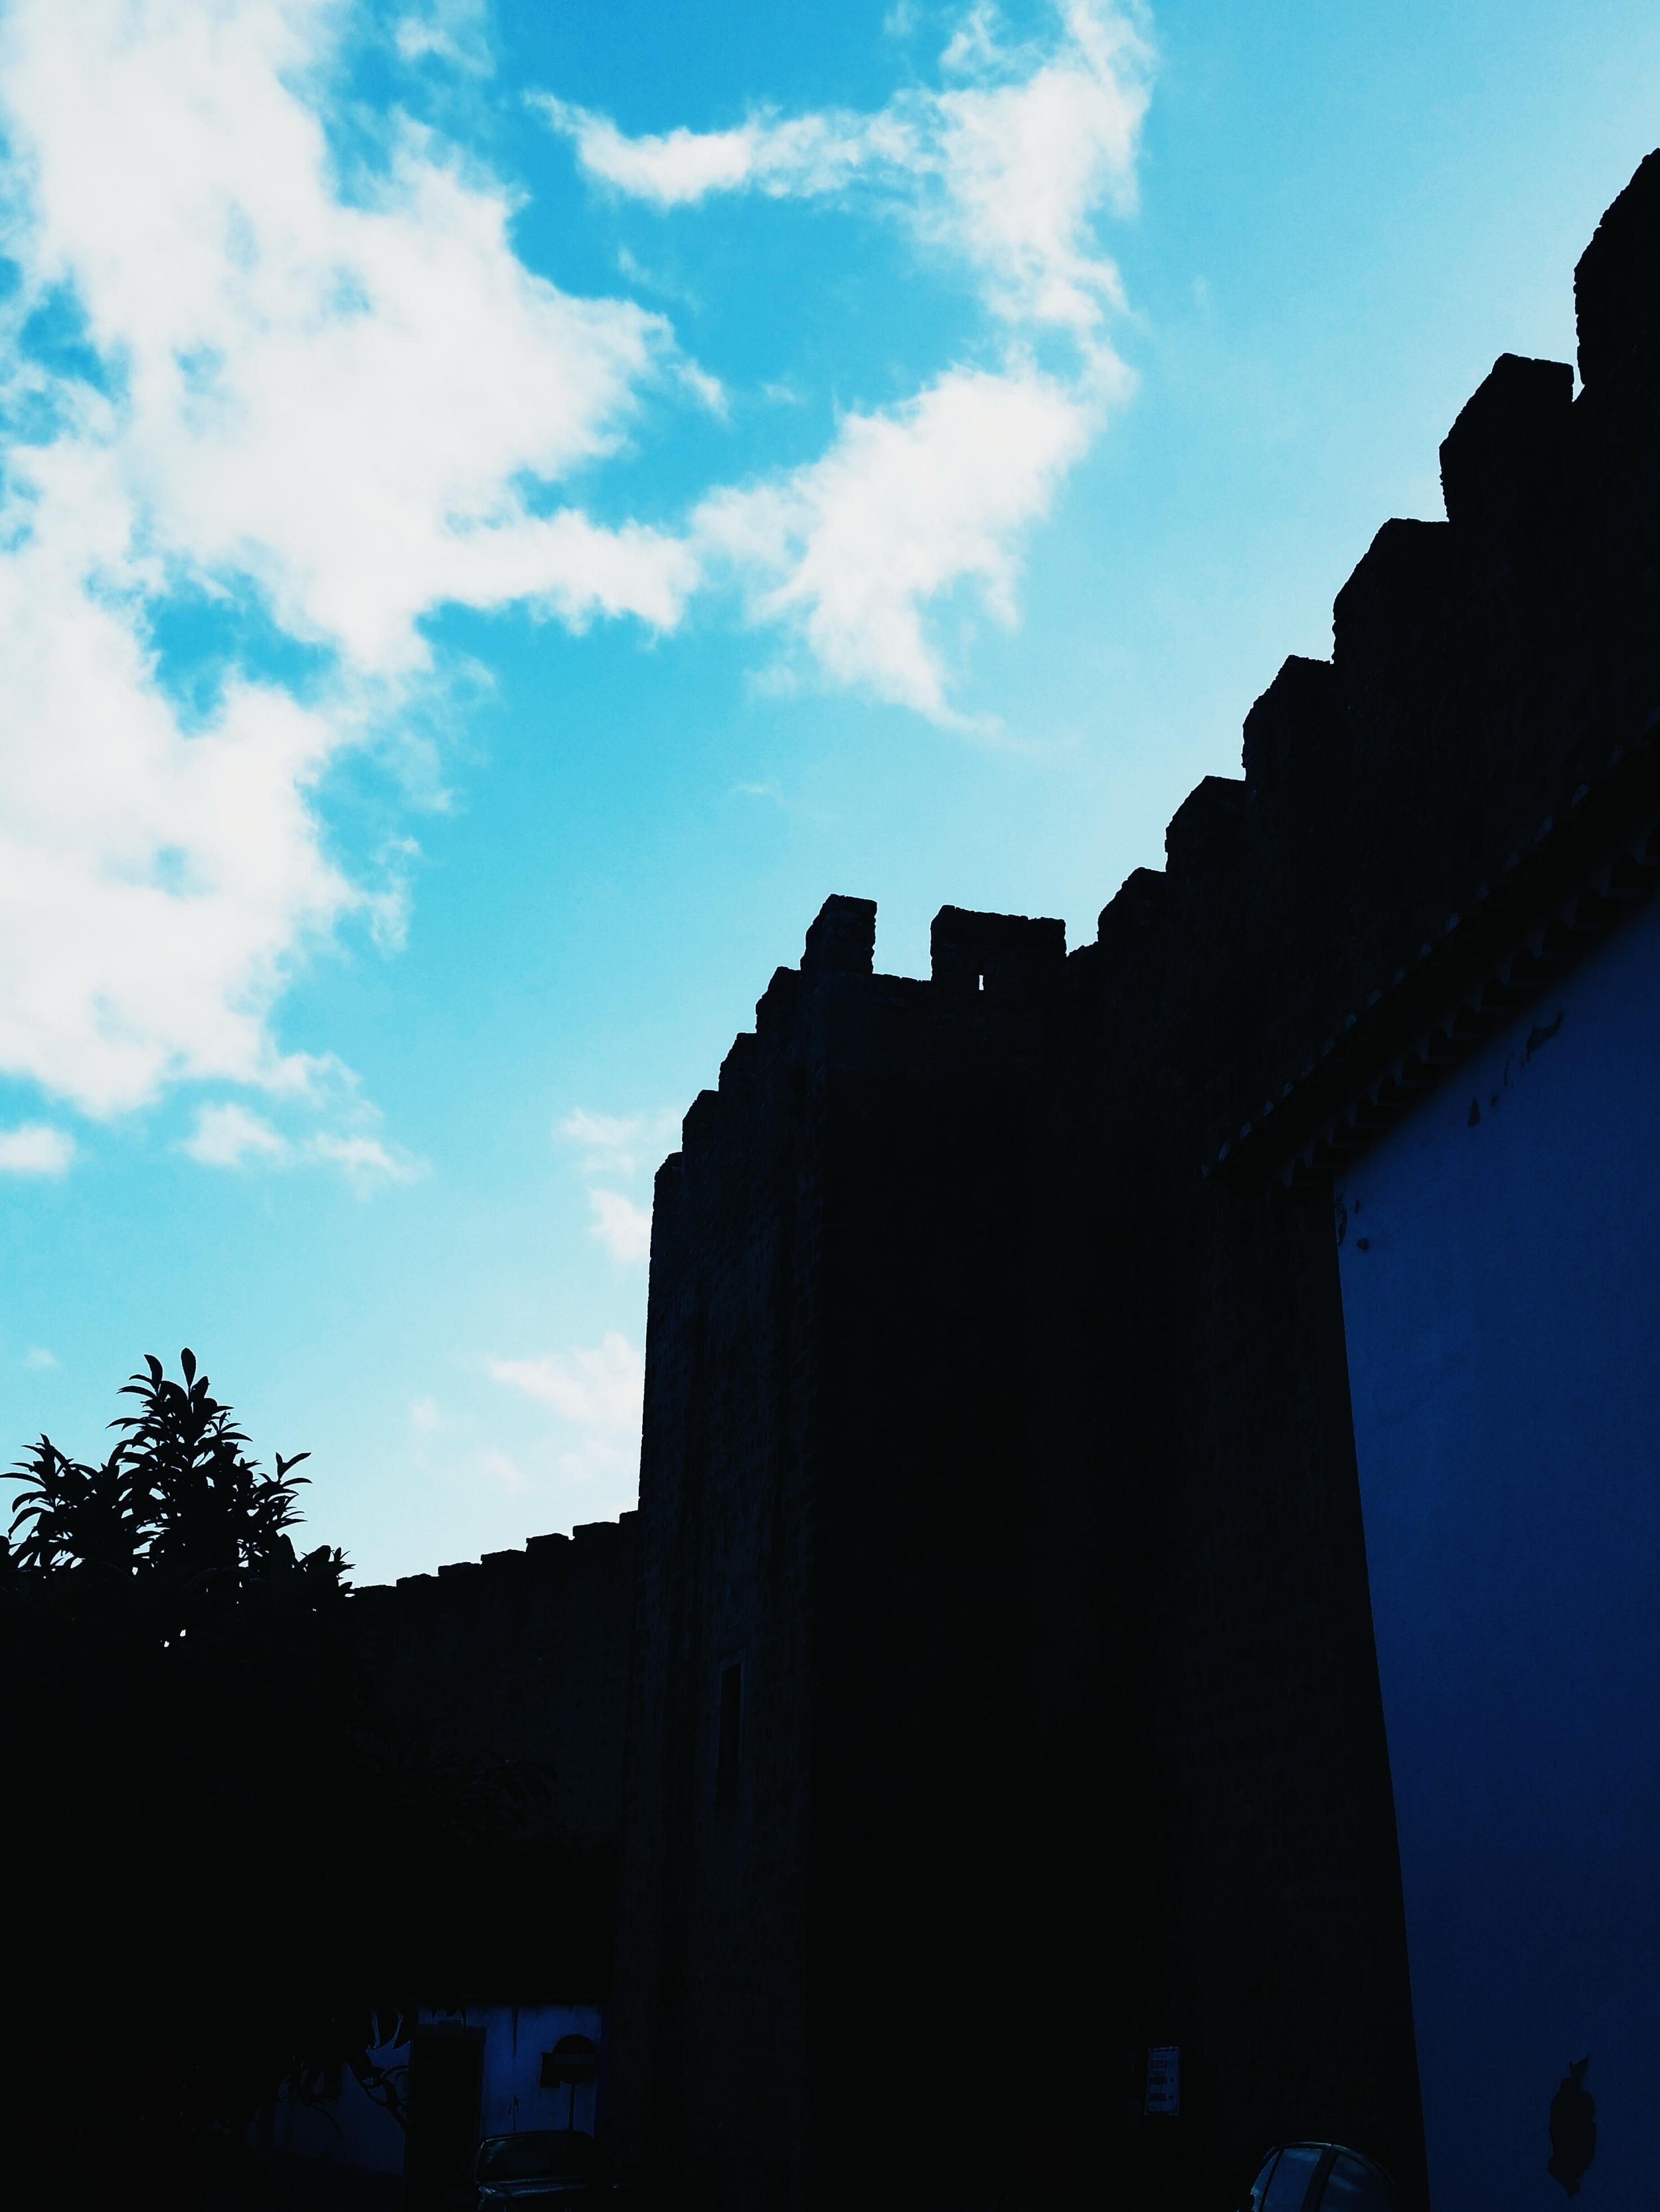 The Wall of Óbidos